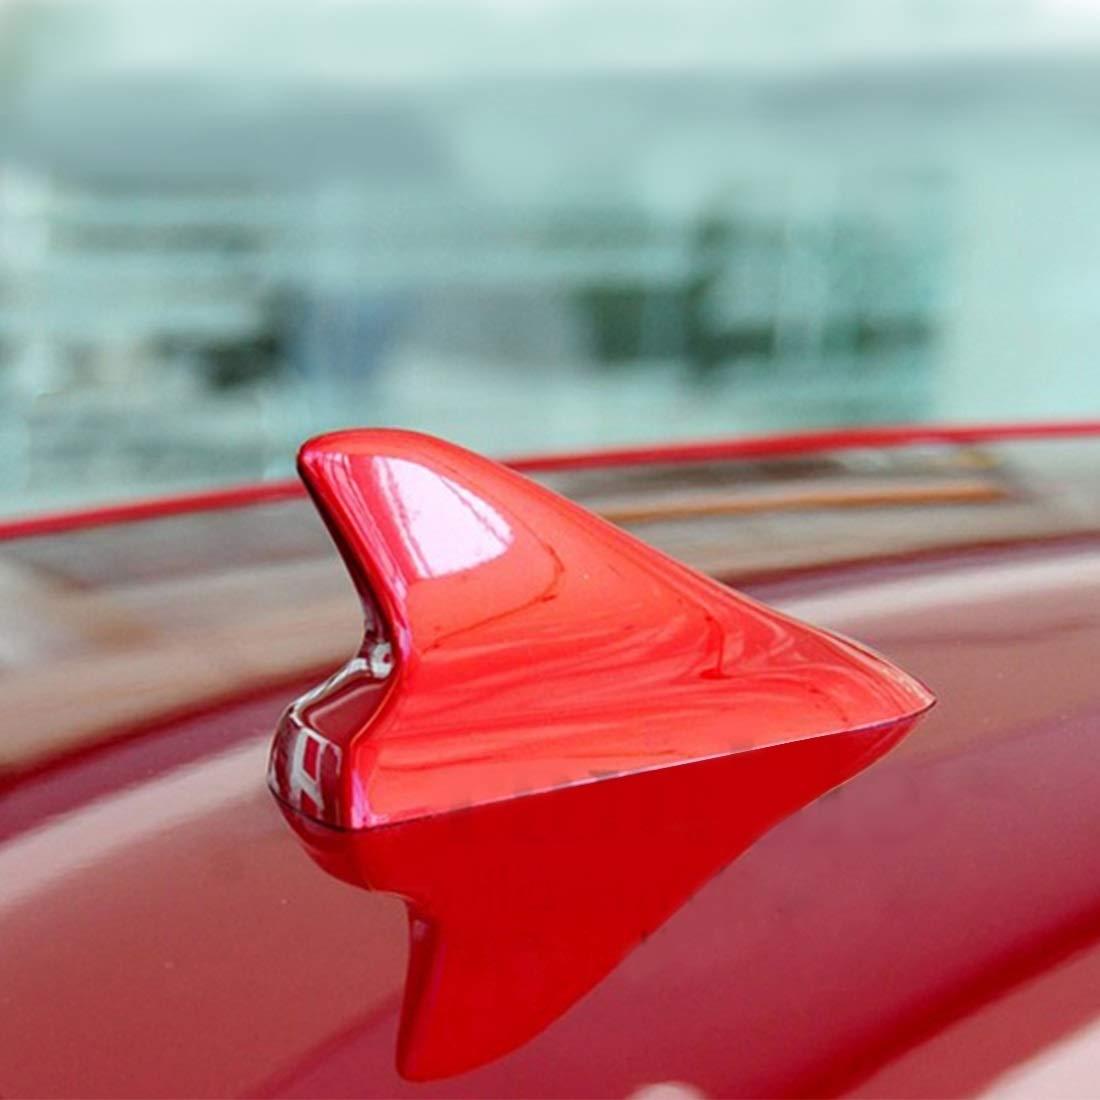 Fdslywejk Autofilm-Auto-Aufkleber Usableness A-886 Auto Auto Haifischflosse Dome Antenne Dekoration for Honda Buick Nissan Hyundai Toyota Volkswagen Mazda Farbe : Color2 wei/ß